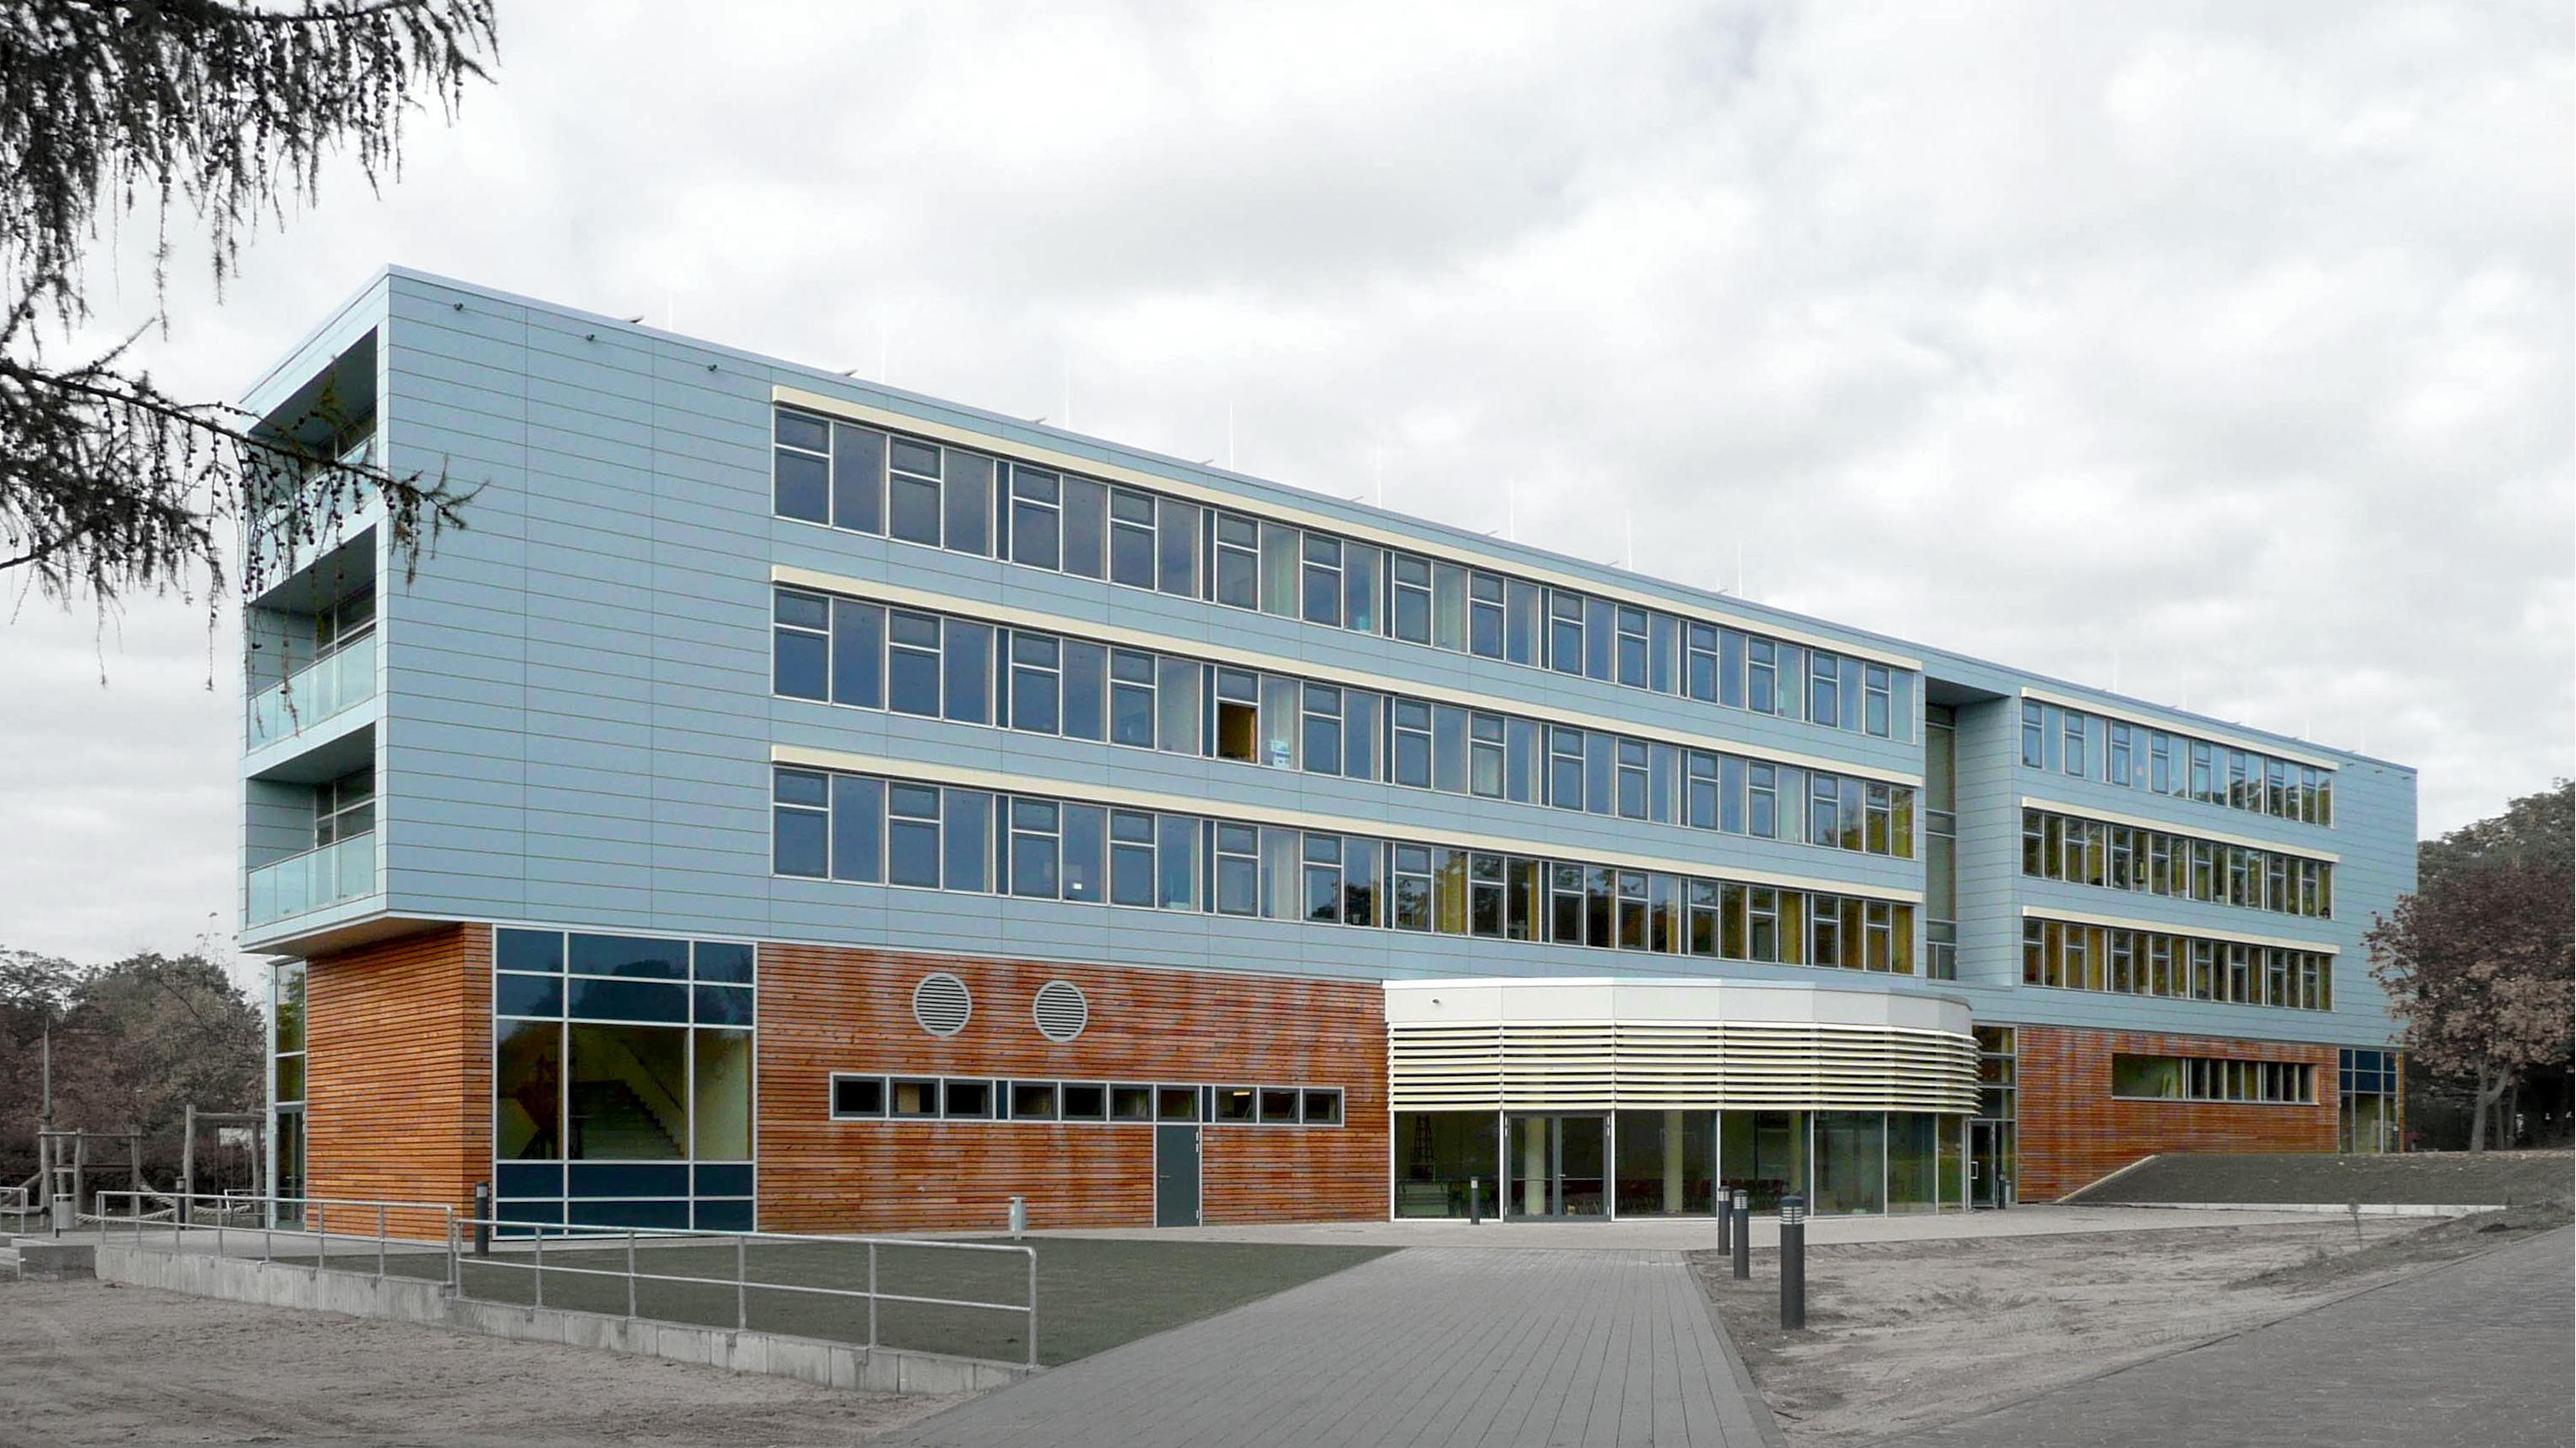 03-grundschule-bernau-blumenhag-w